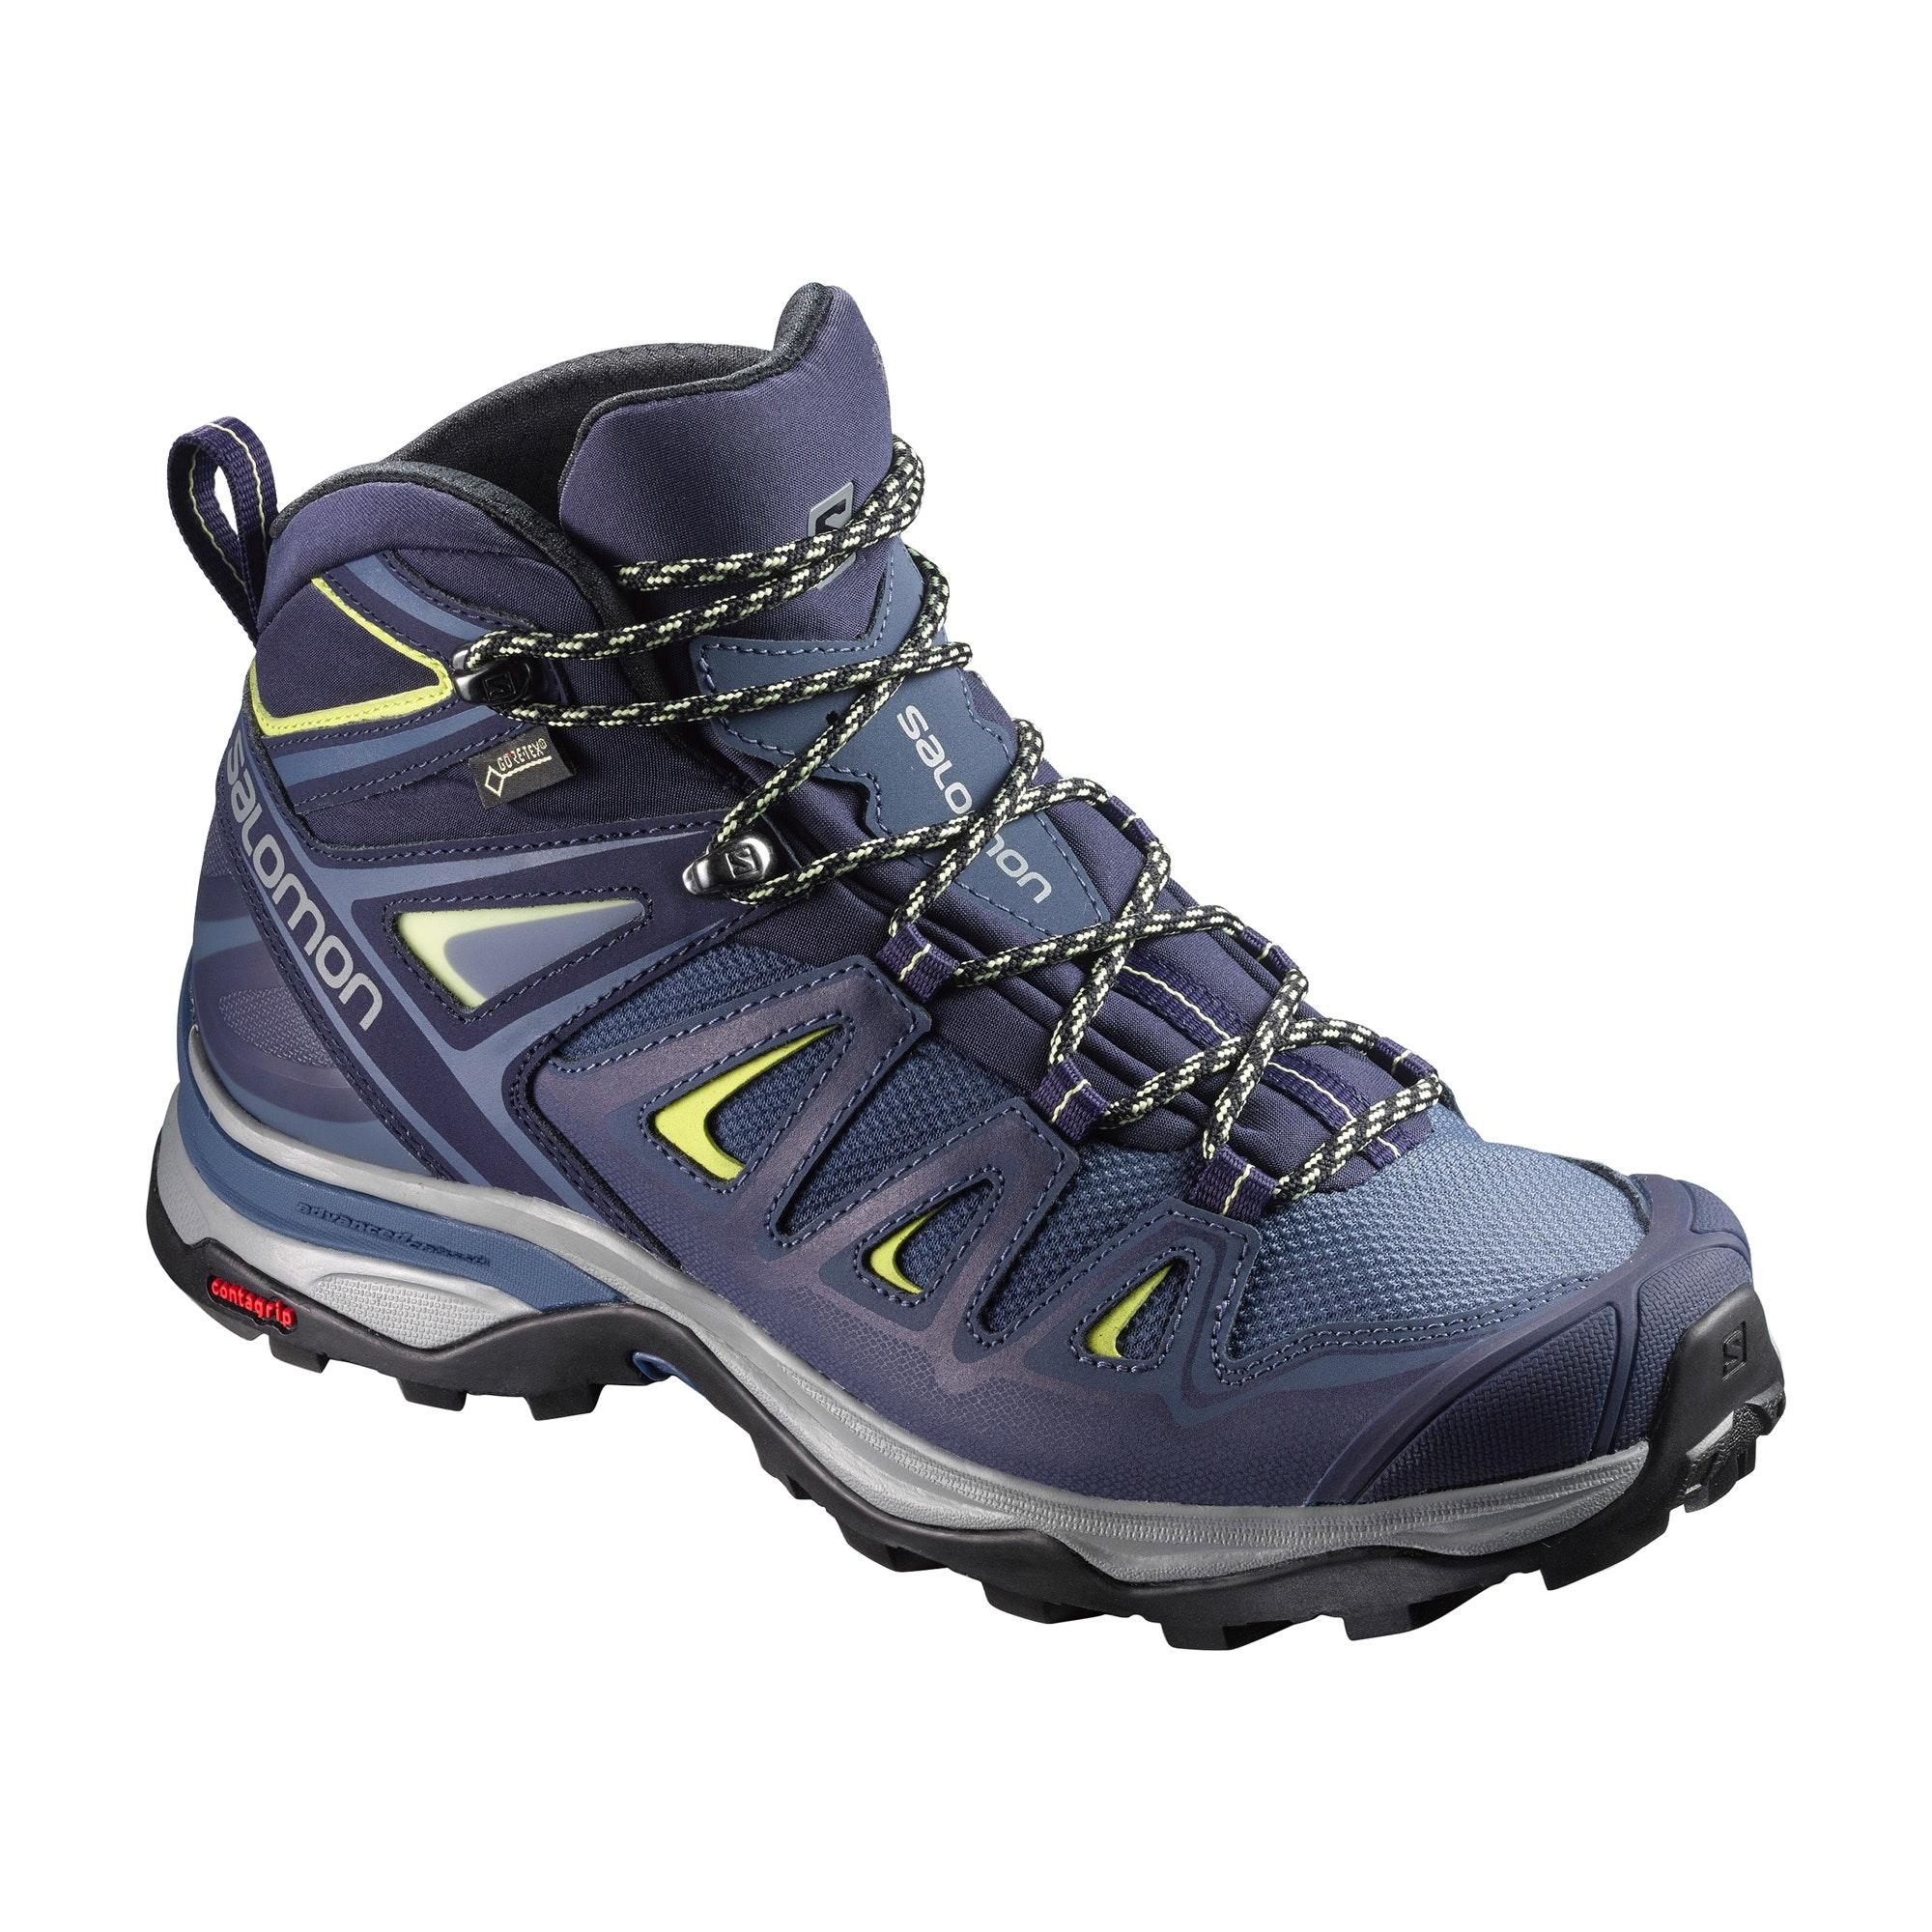 614f524665 Salomon X Ultra 3 Mid GORE-TEX Women's Boots